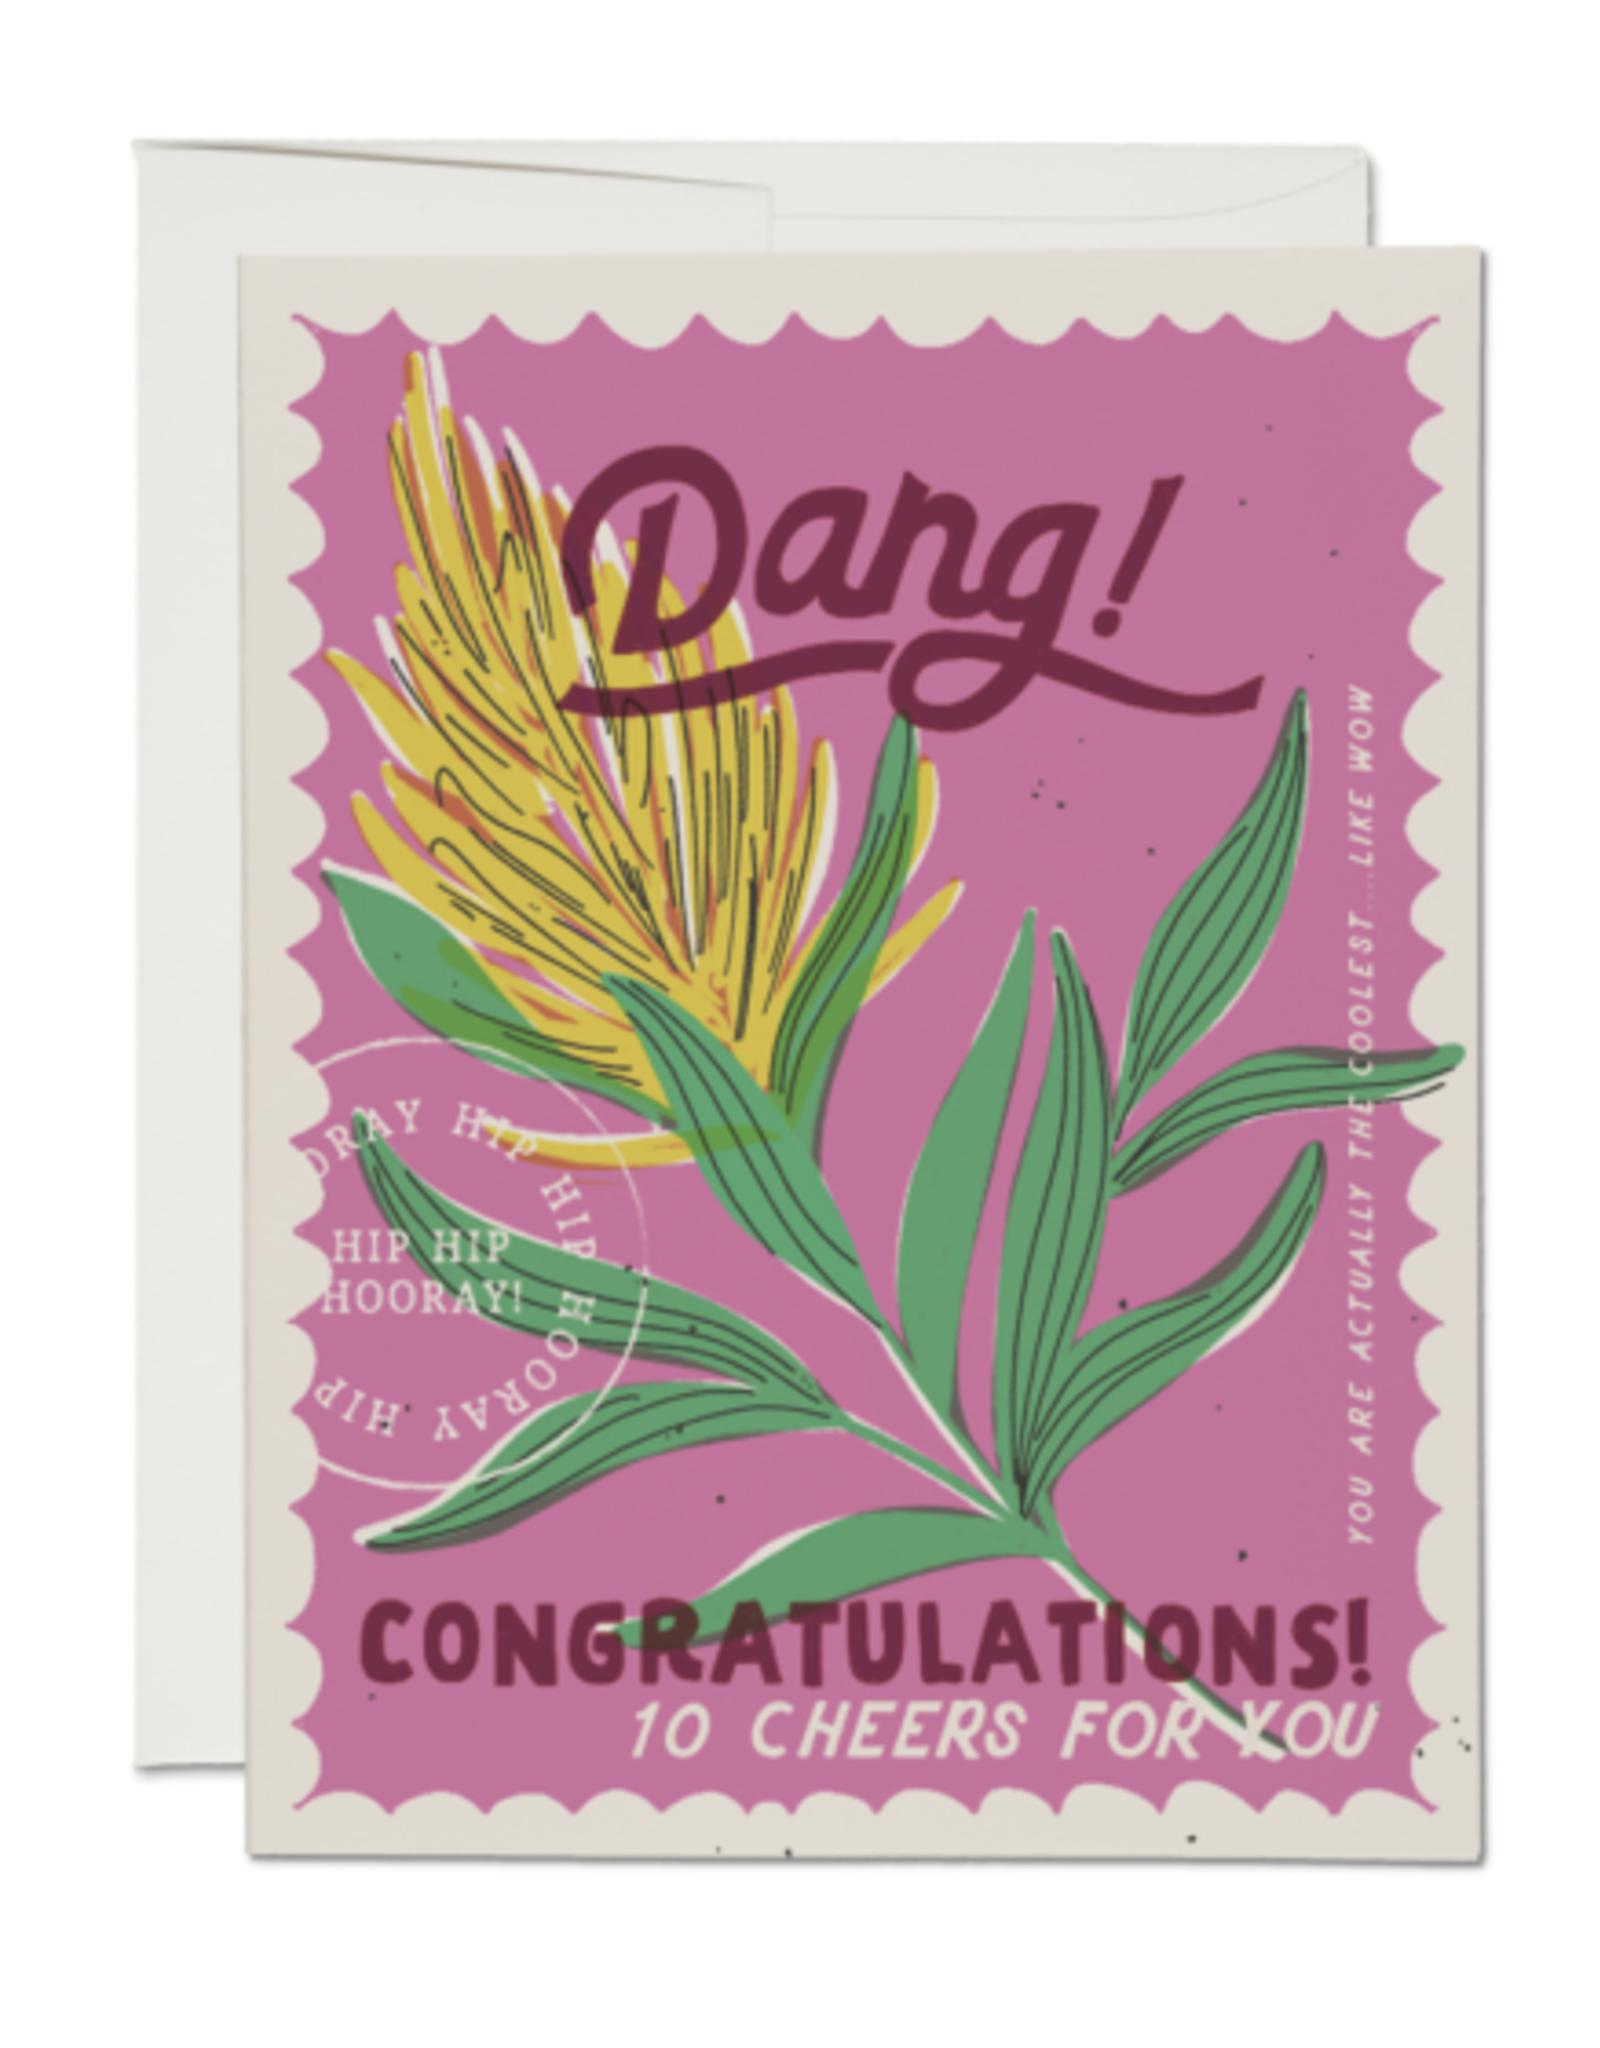 Dang Congrats Stamp Greeting Card